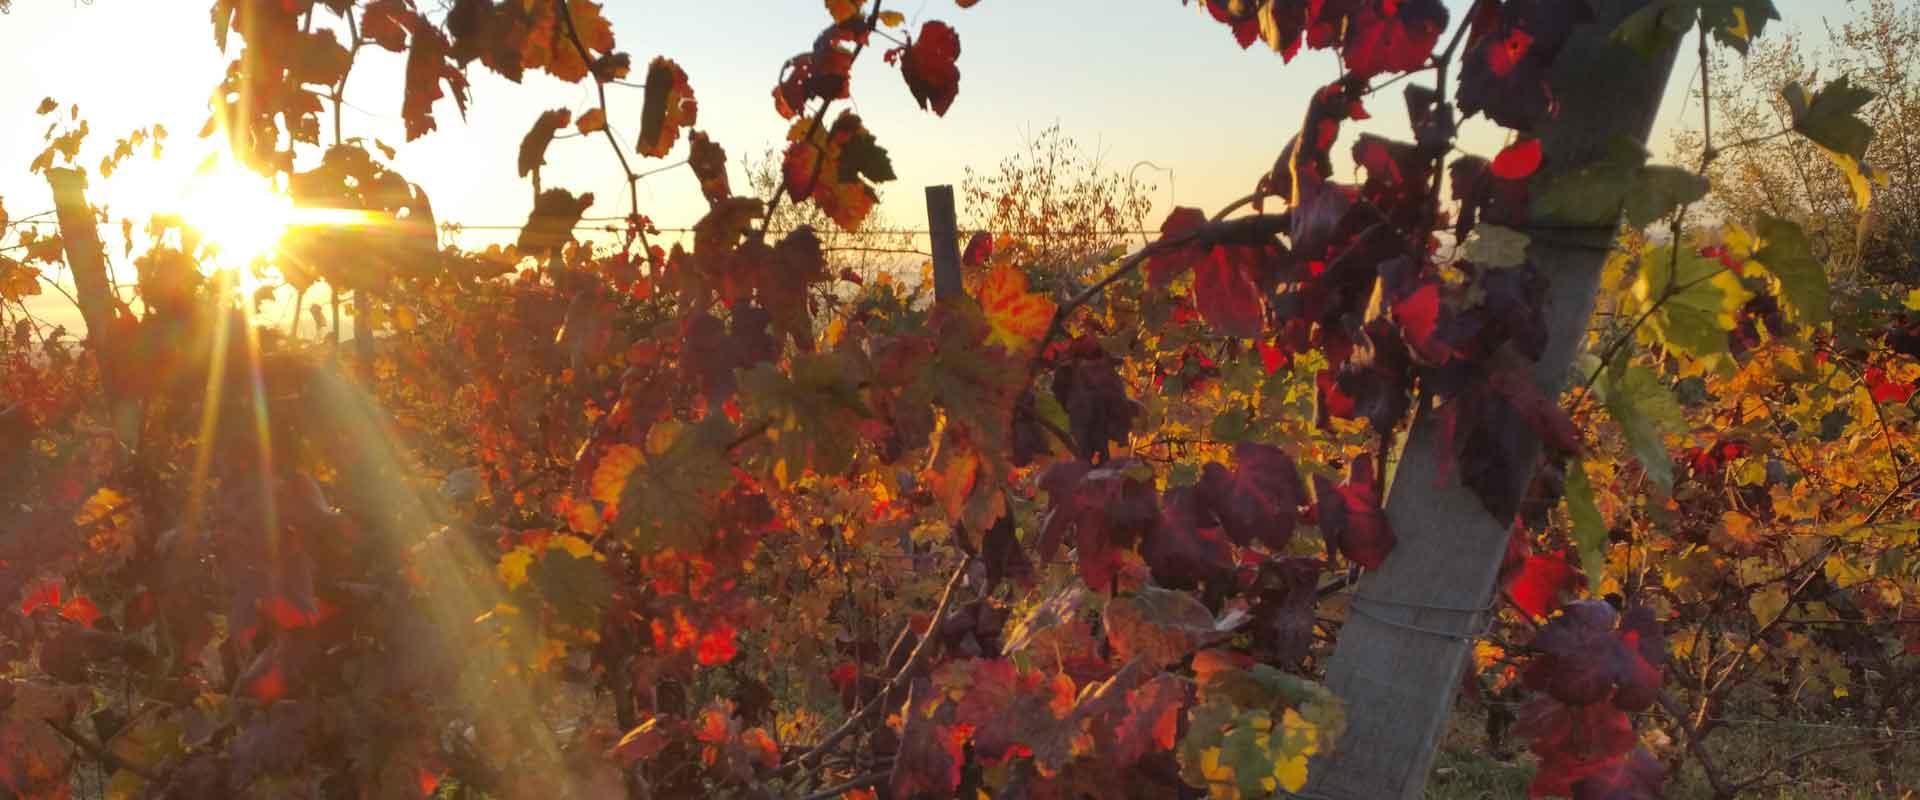 Sentieri tra le vigne